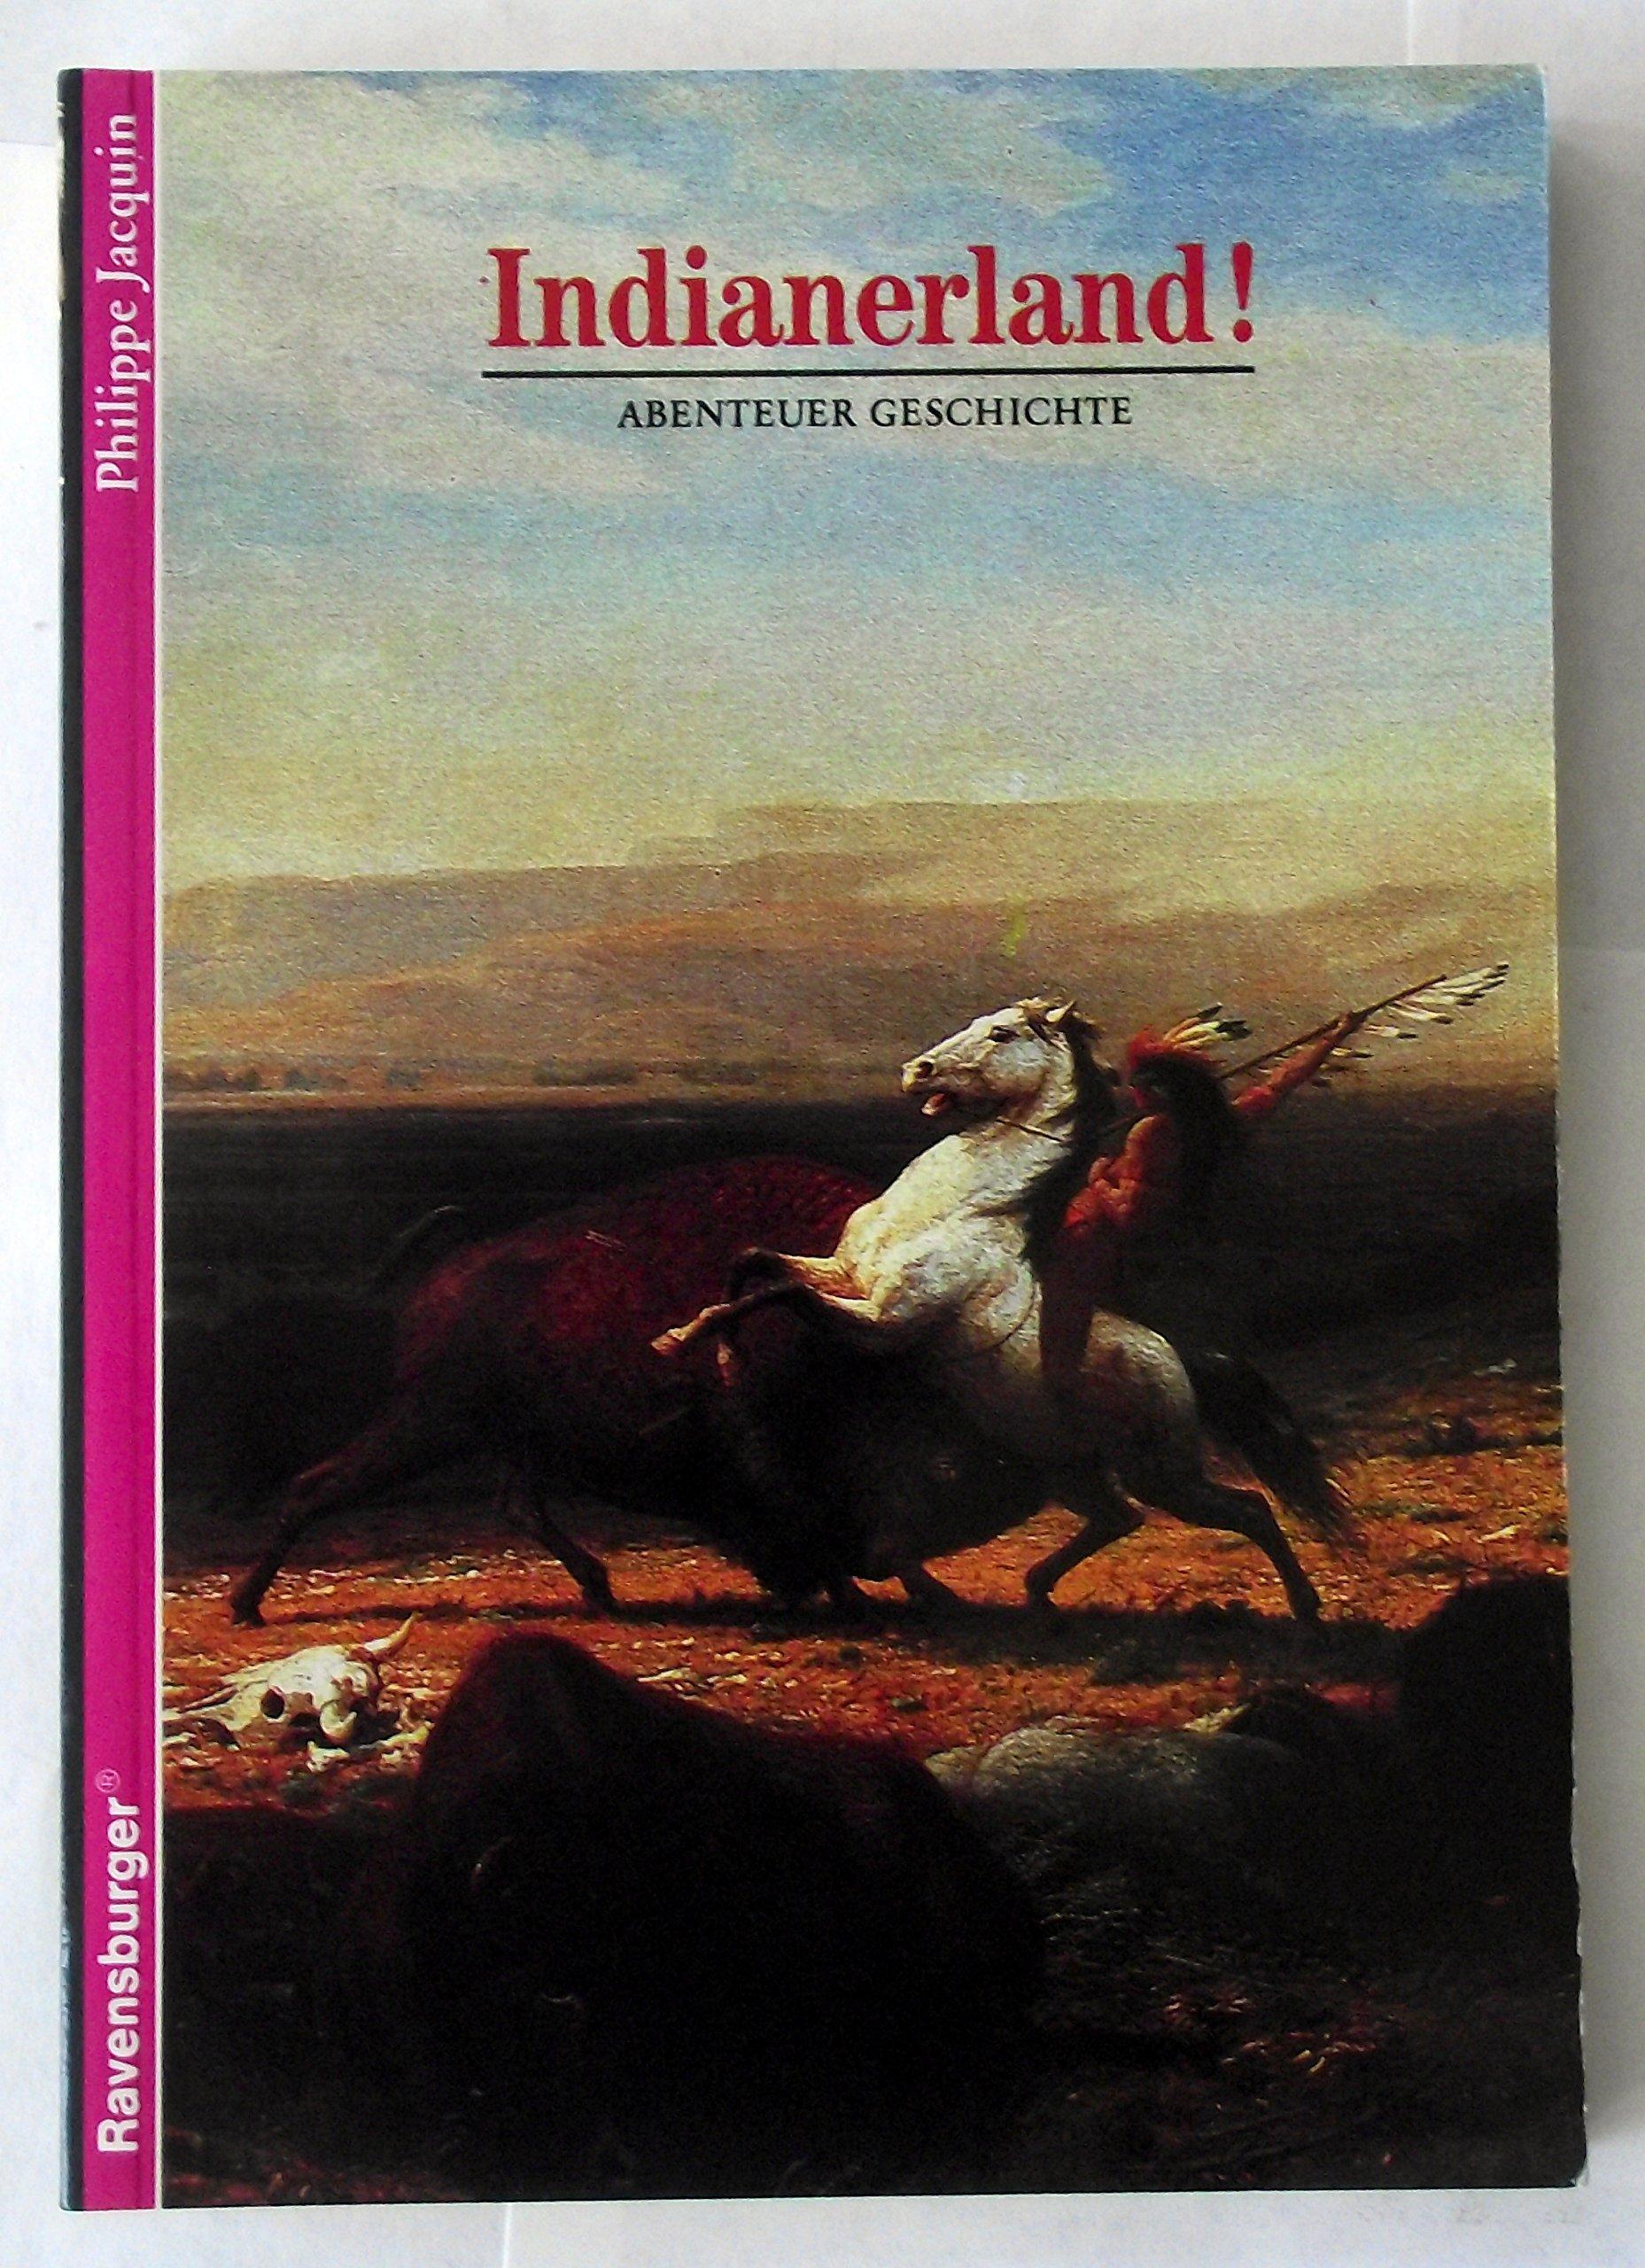 Indianerland